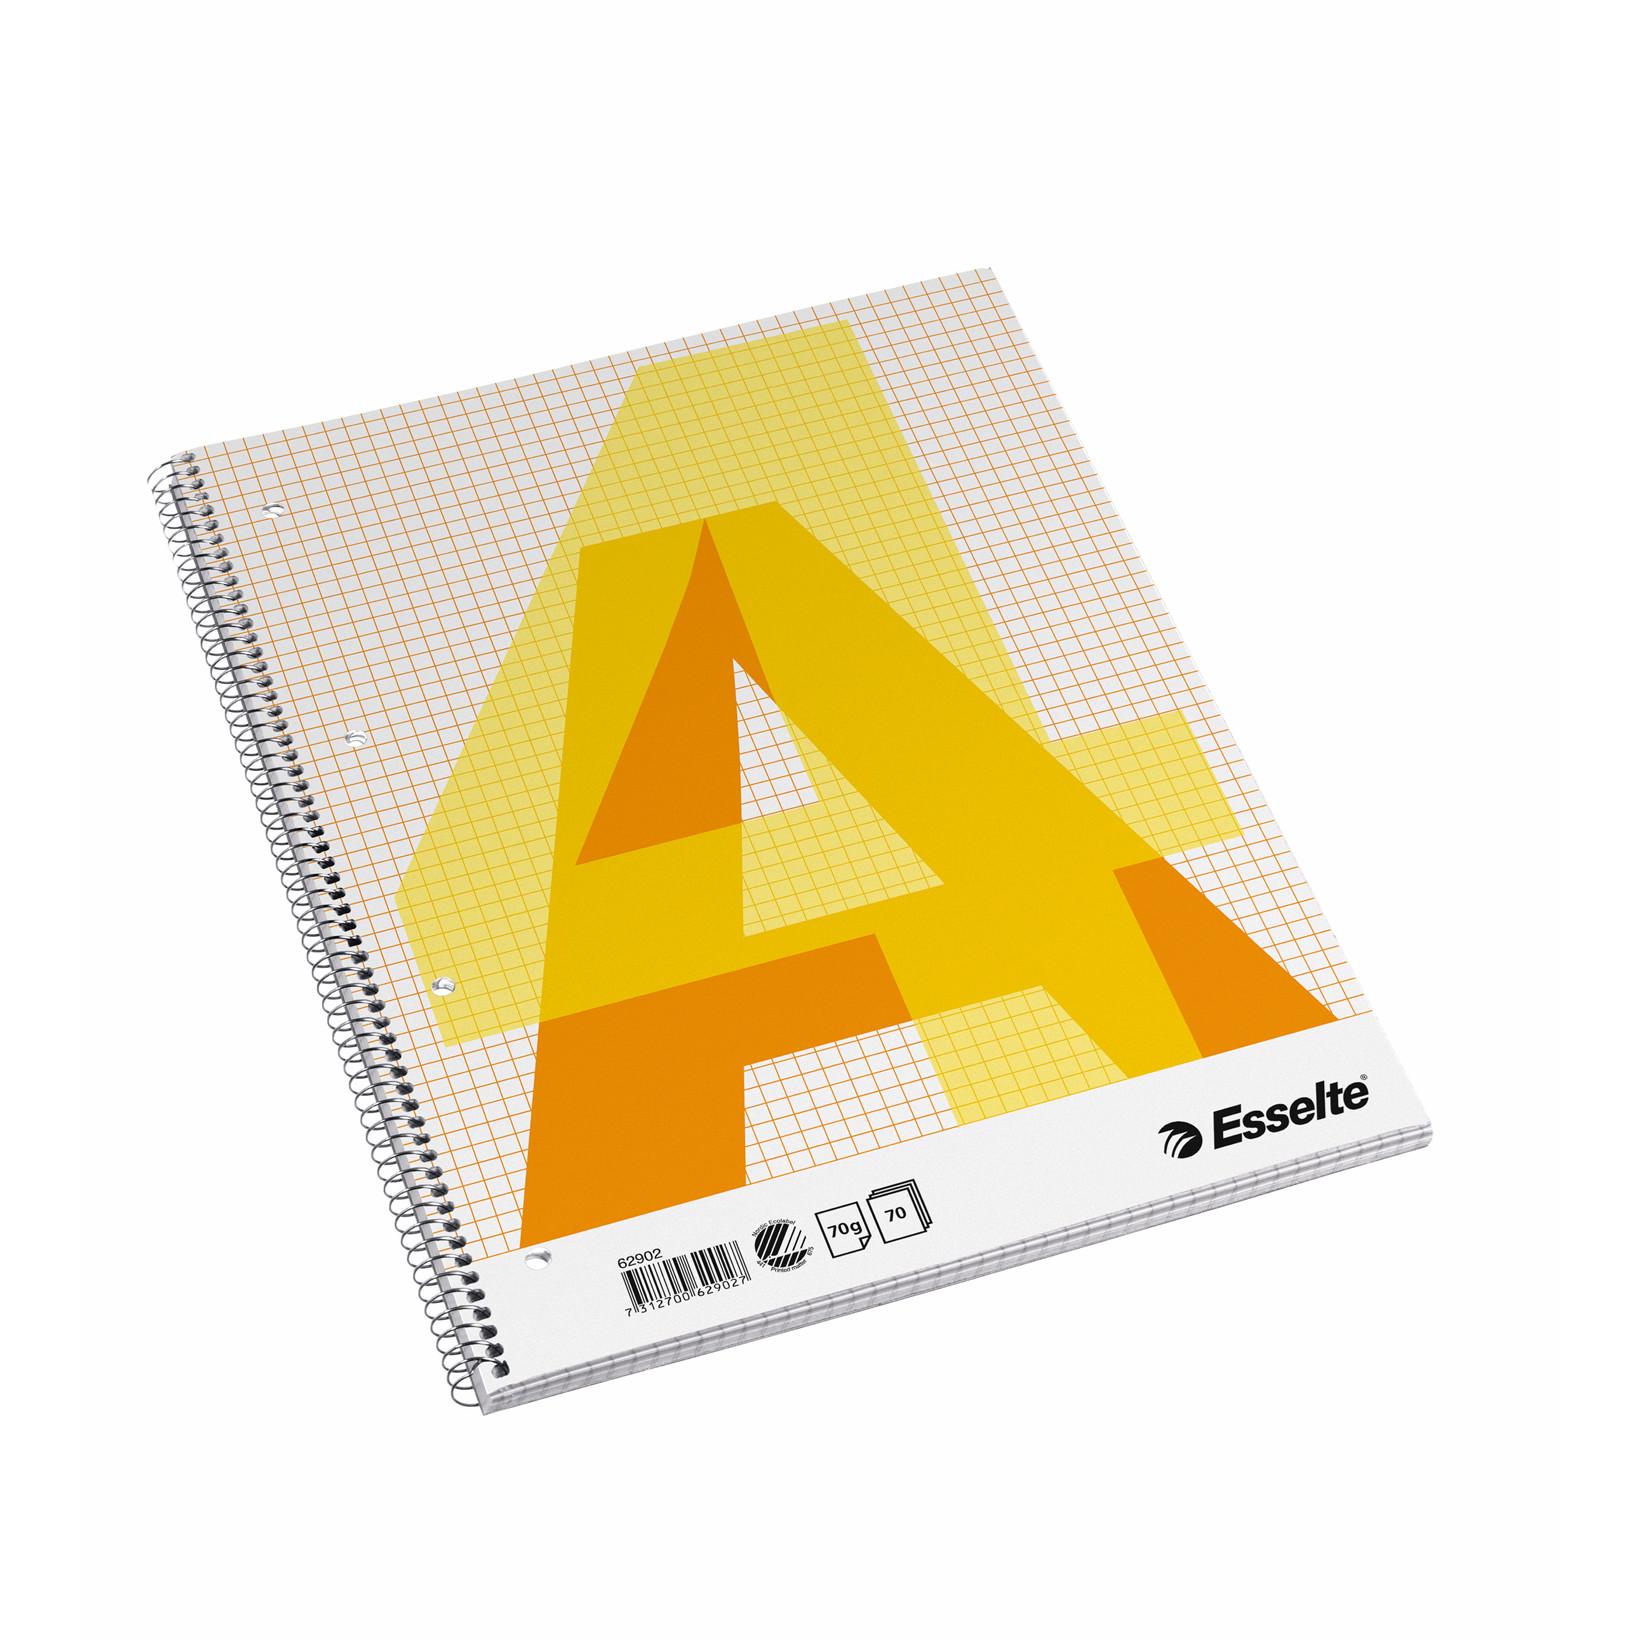 Kollegieblok Esselte A4 kvadreret med spiralryg - 70 sider